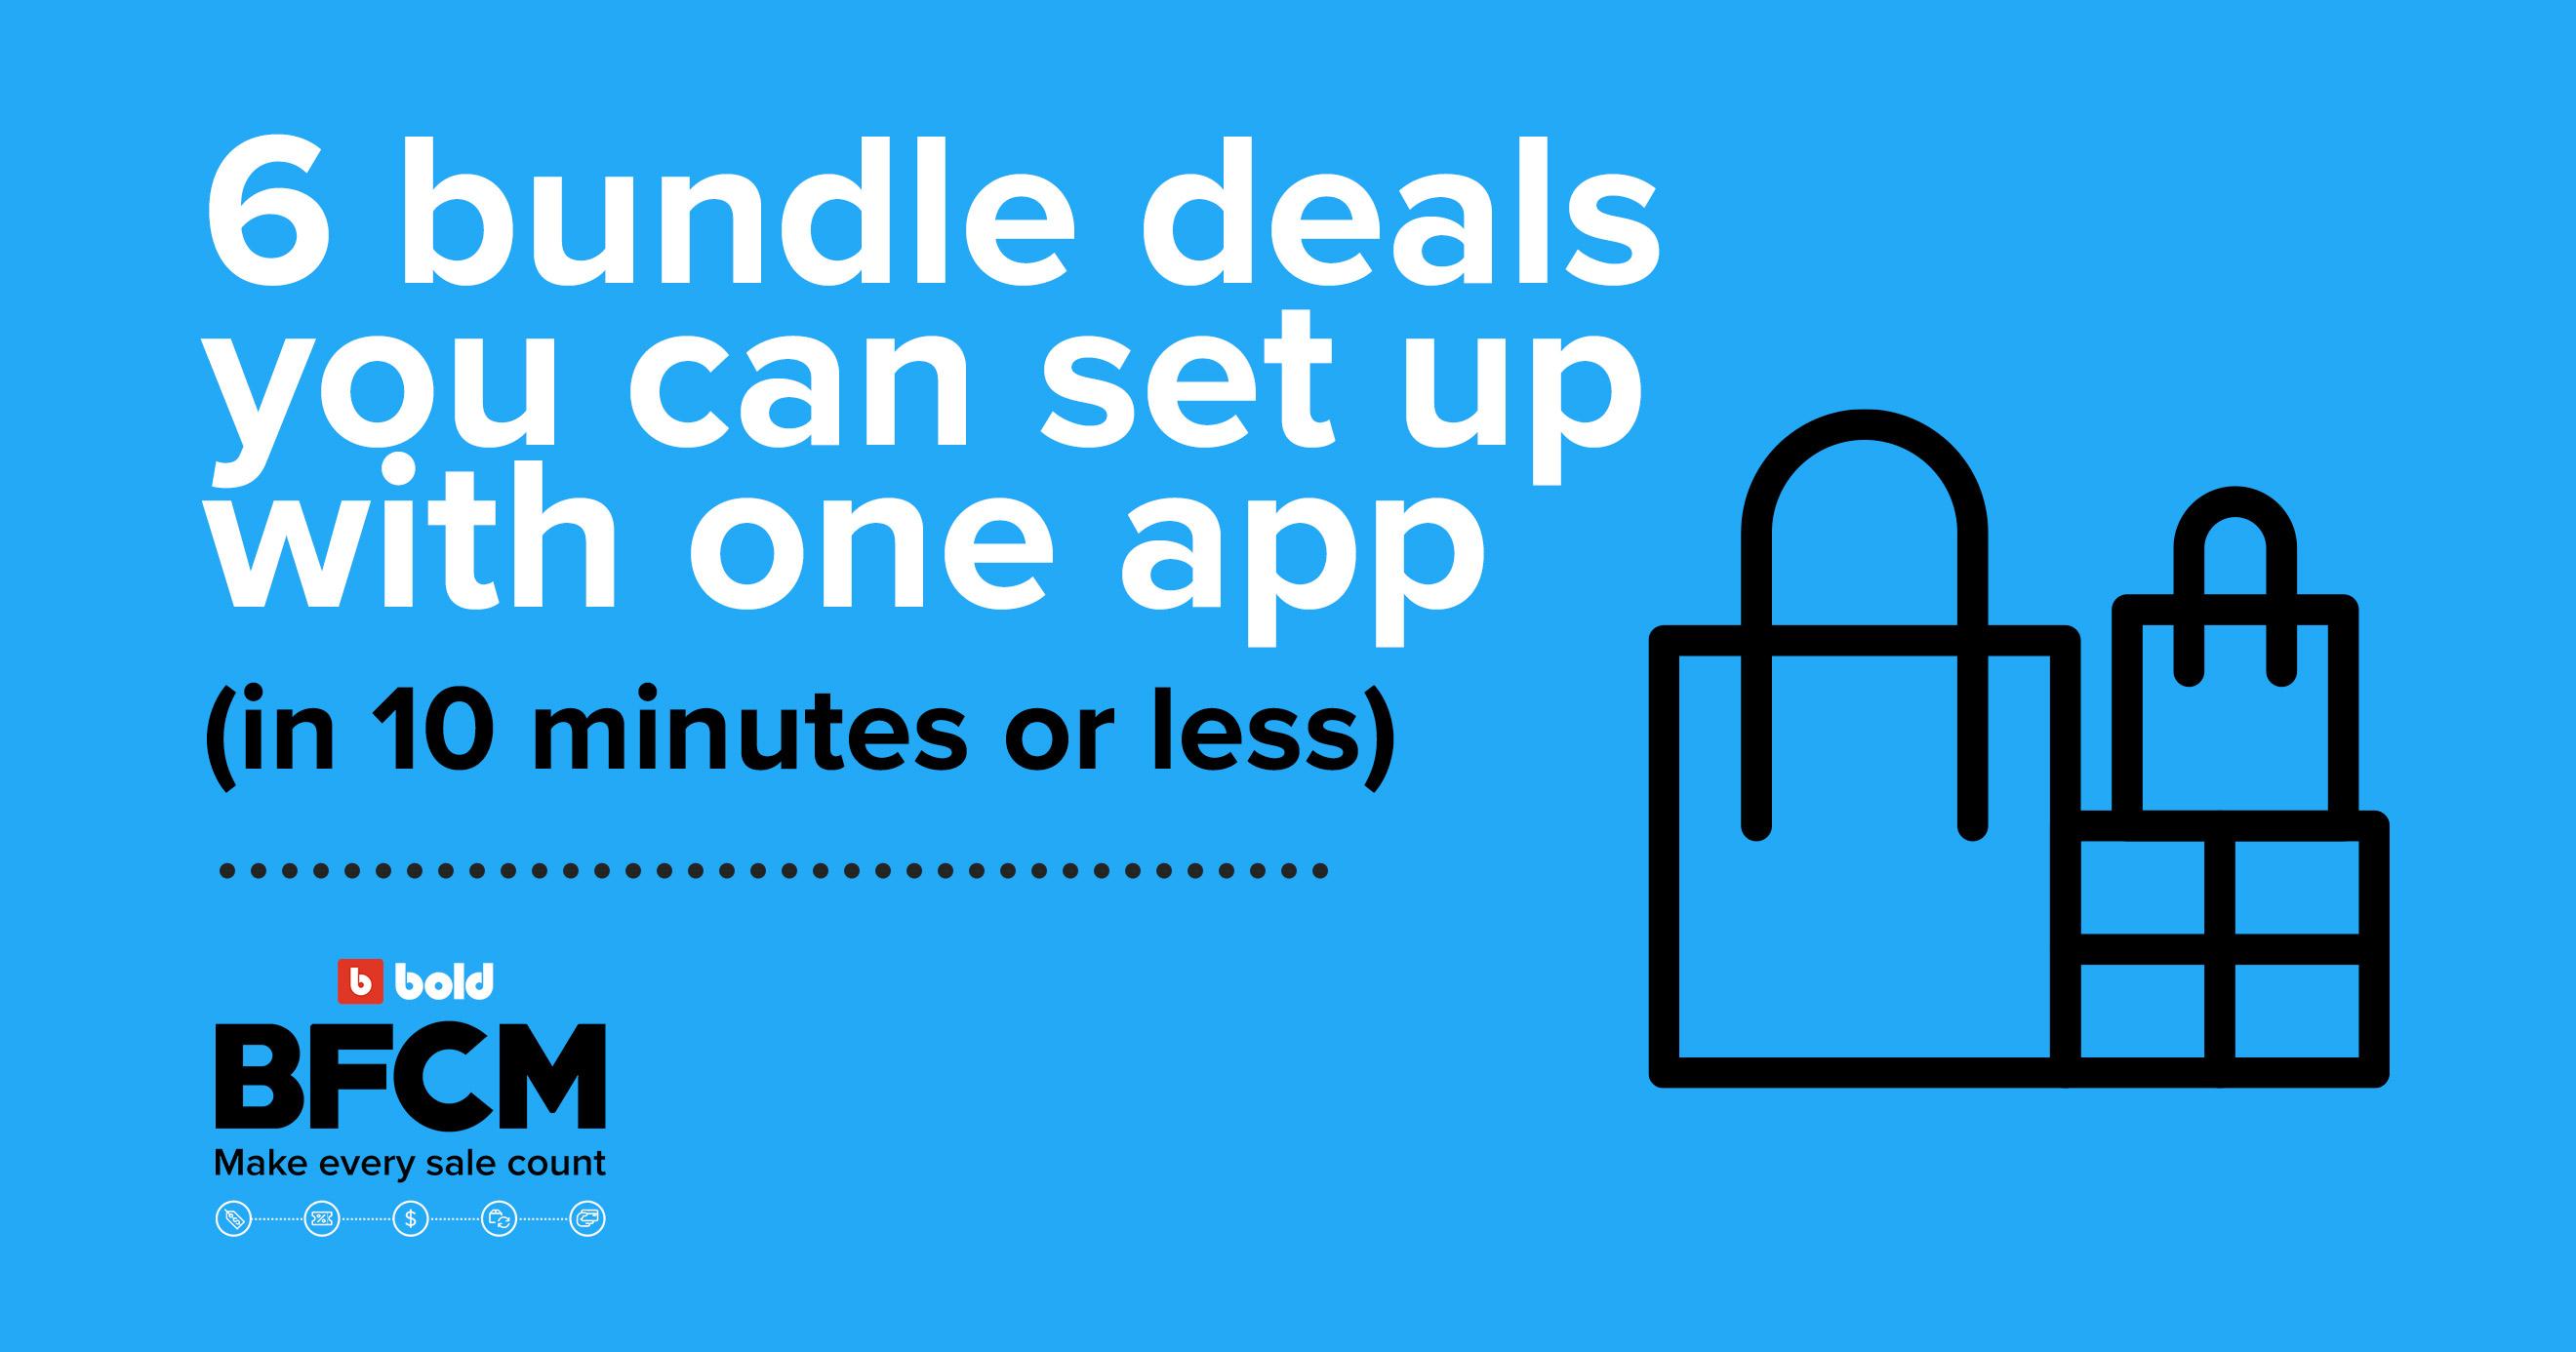 how-to-set-up-bundled-deals